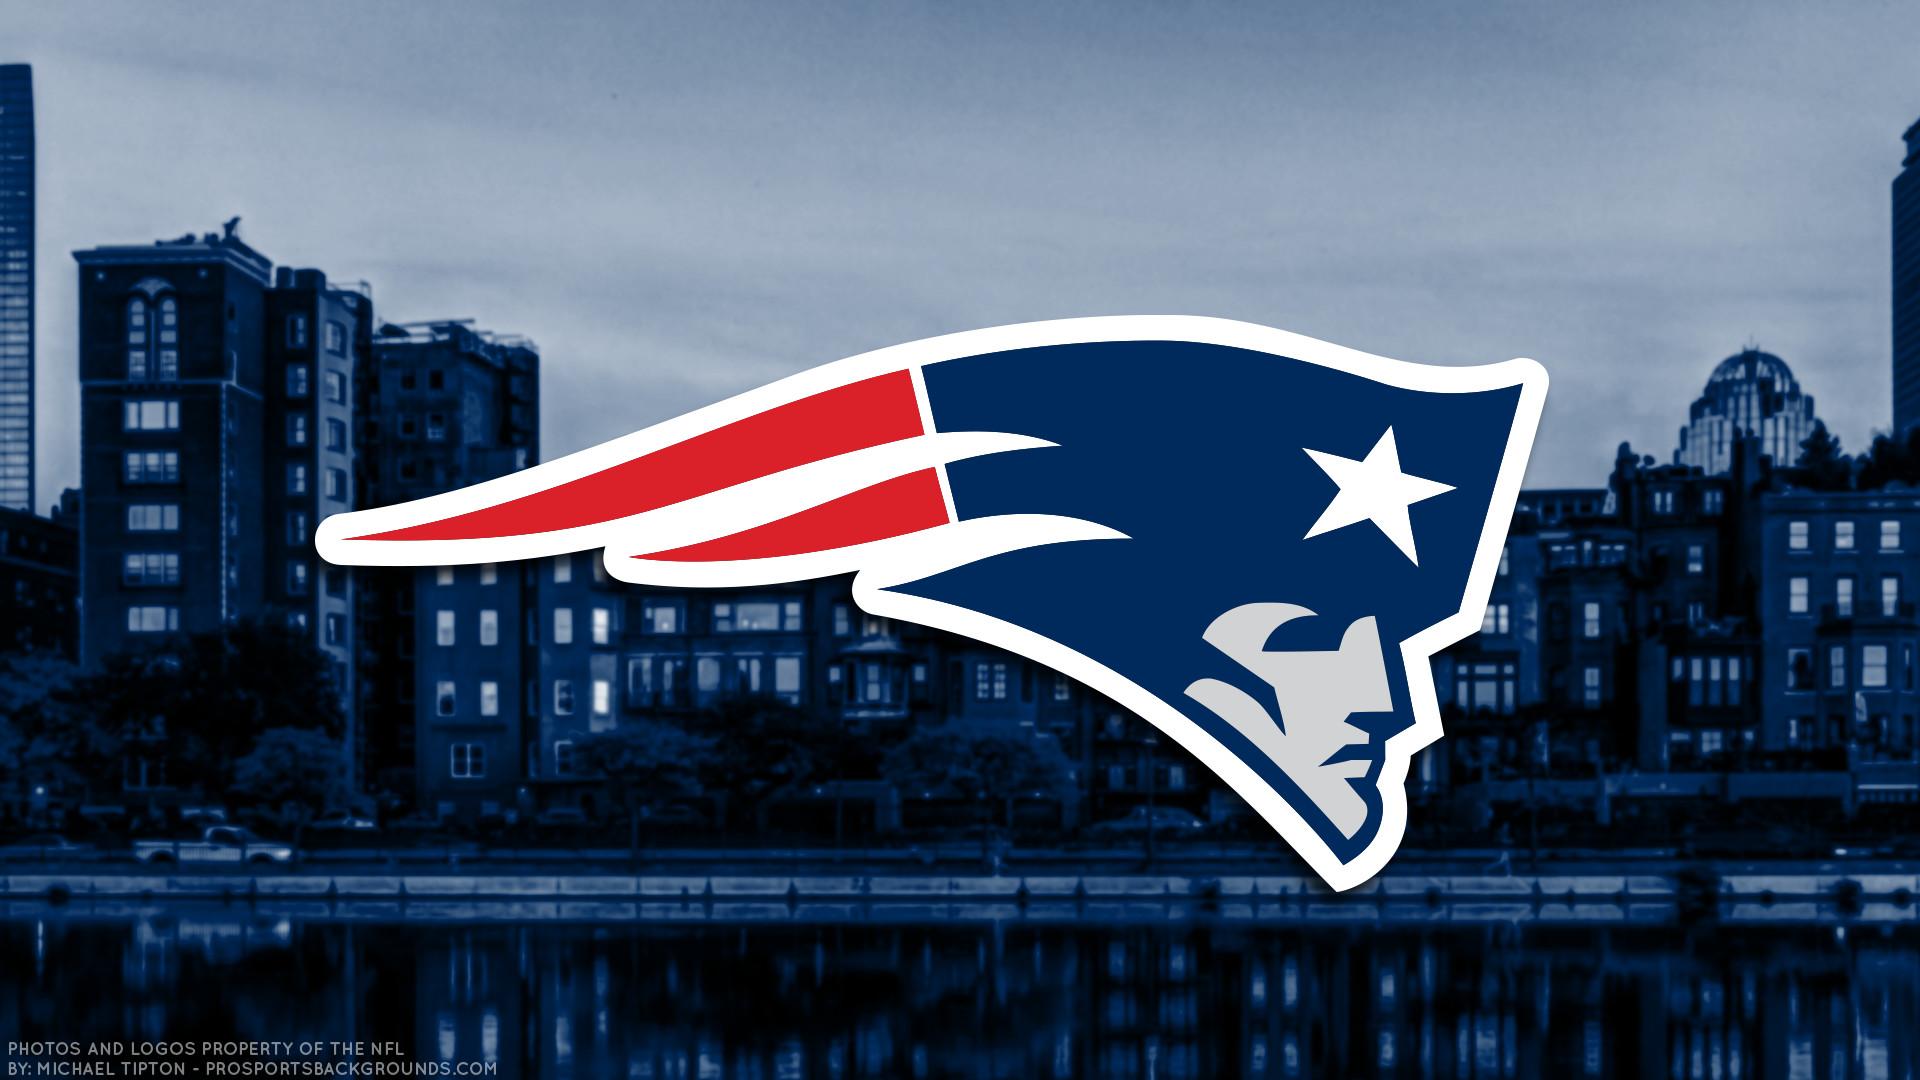 New England Patriots 2017 football logo wallpaper pc desktop computer .